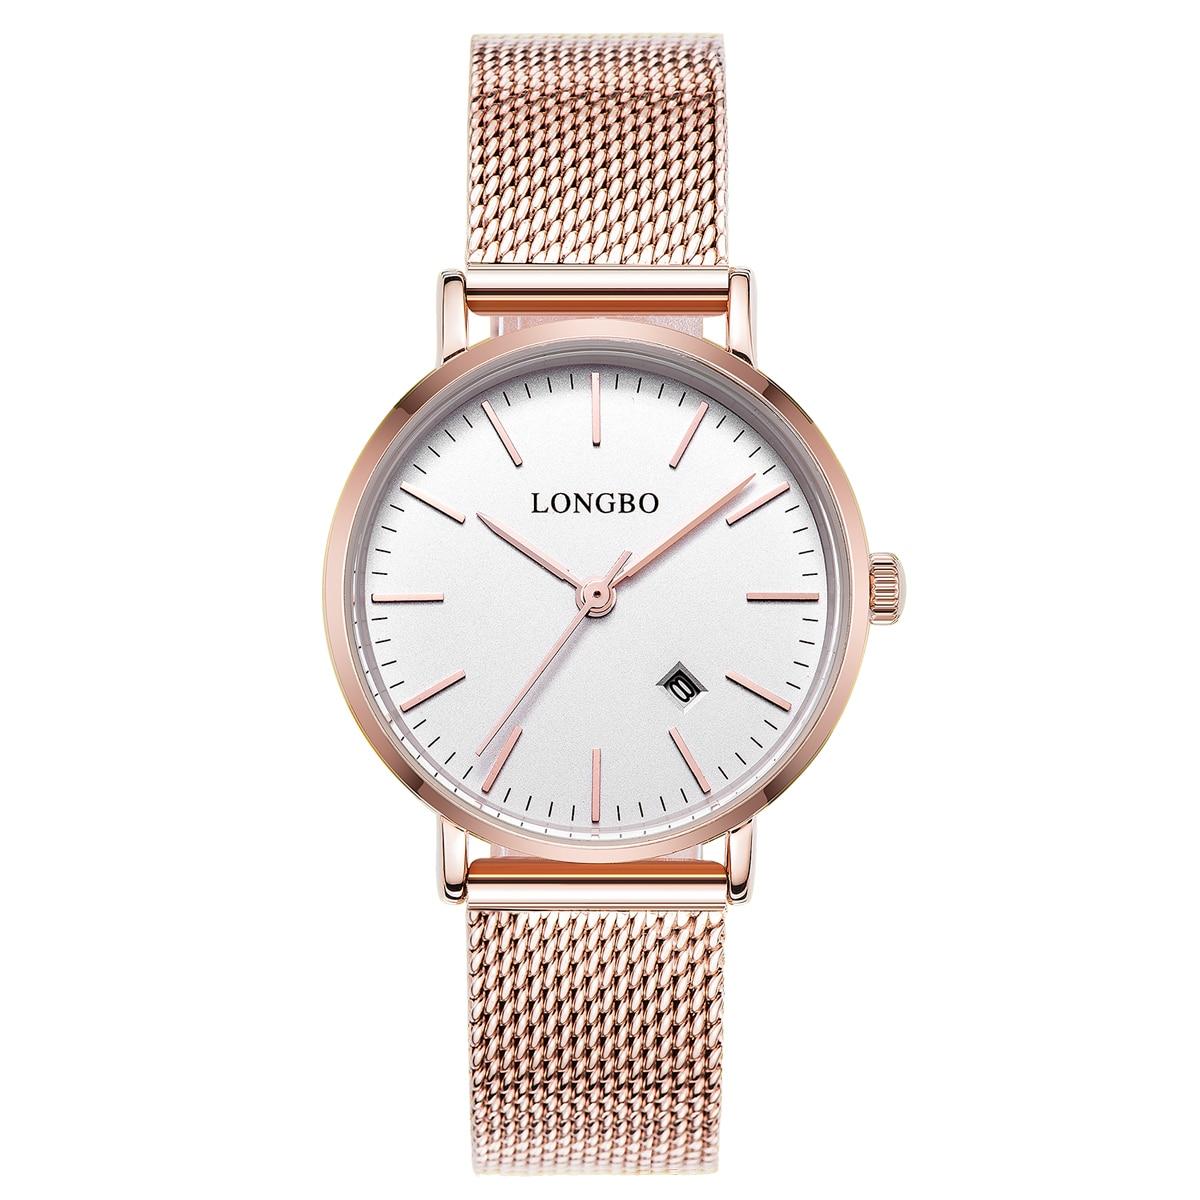 LONGBO Luxury Lovers Watches Men Women Automatical Calendar Mesh Stainless Steel Adjustable Band Quartz Watch Montre Homme 5009